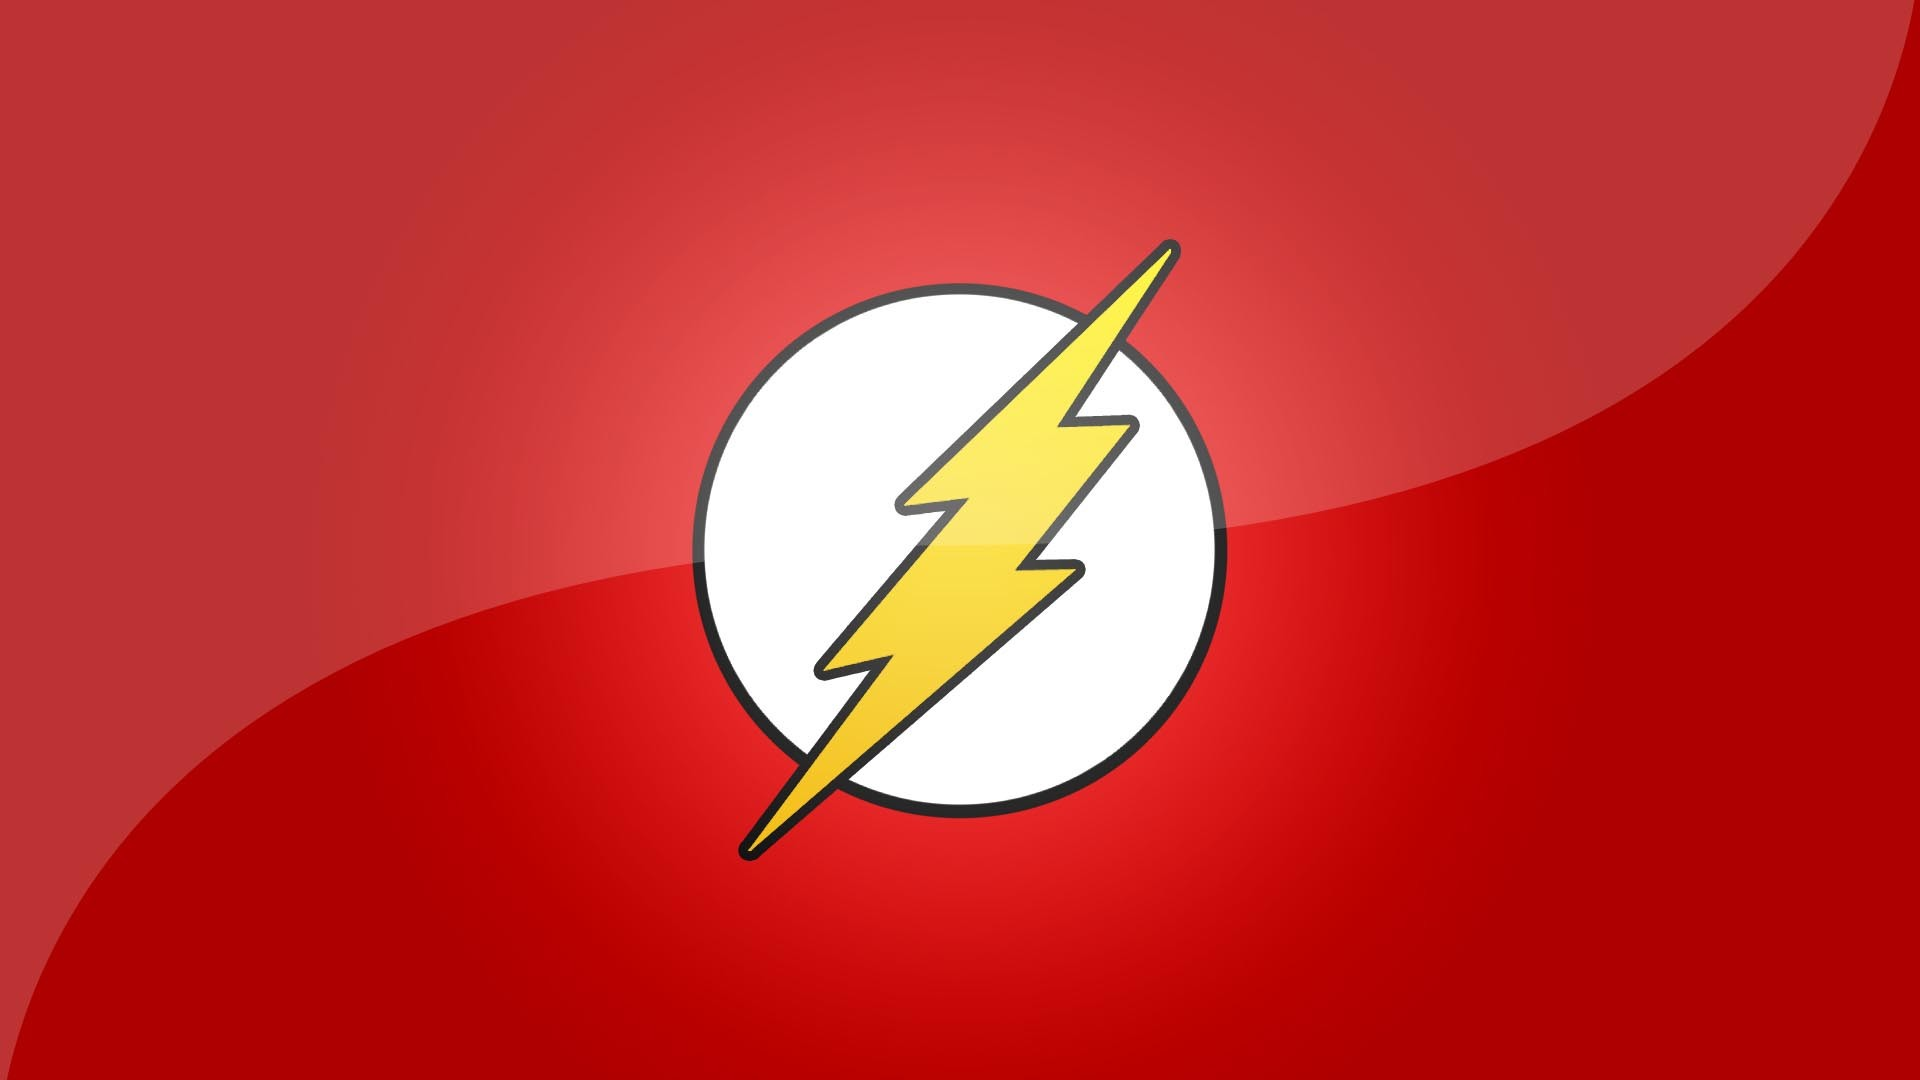 The Flash CW HD desktop wallpaper : Widescreen : High Definition Flash  Wallpapers Wallpapers)